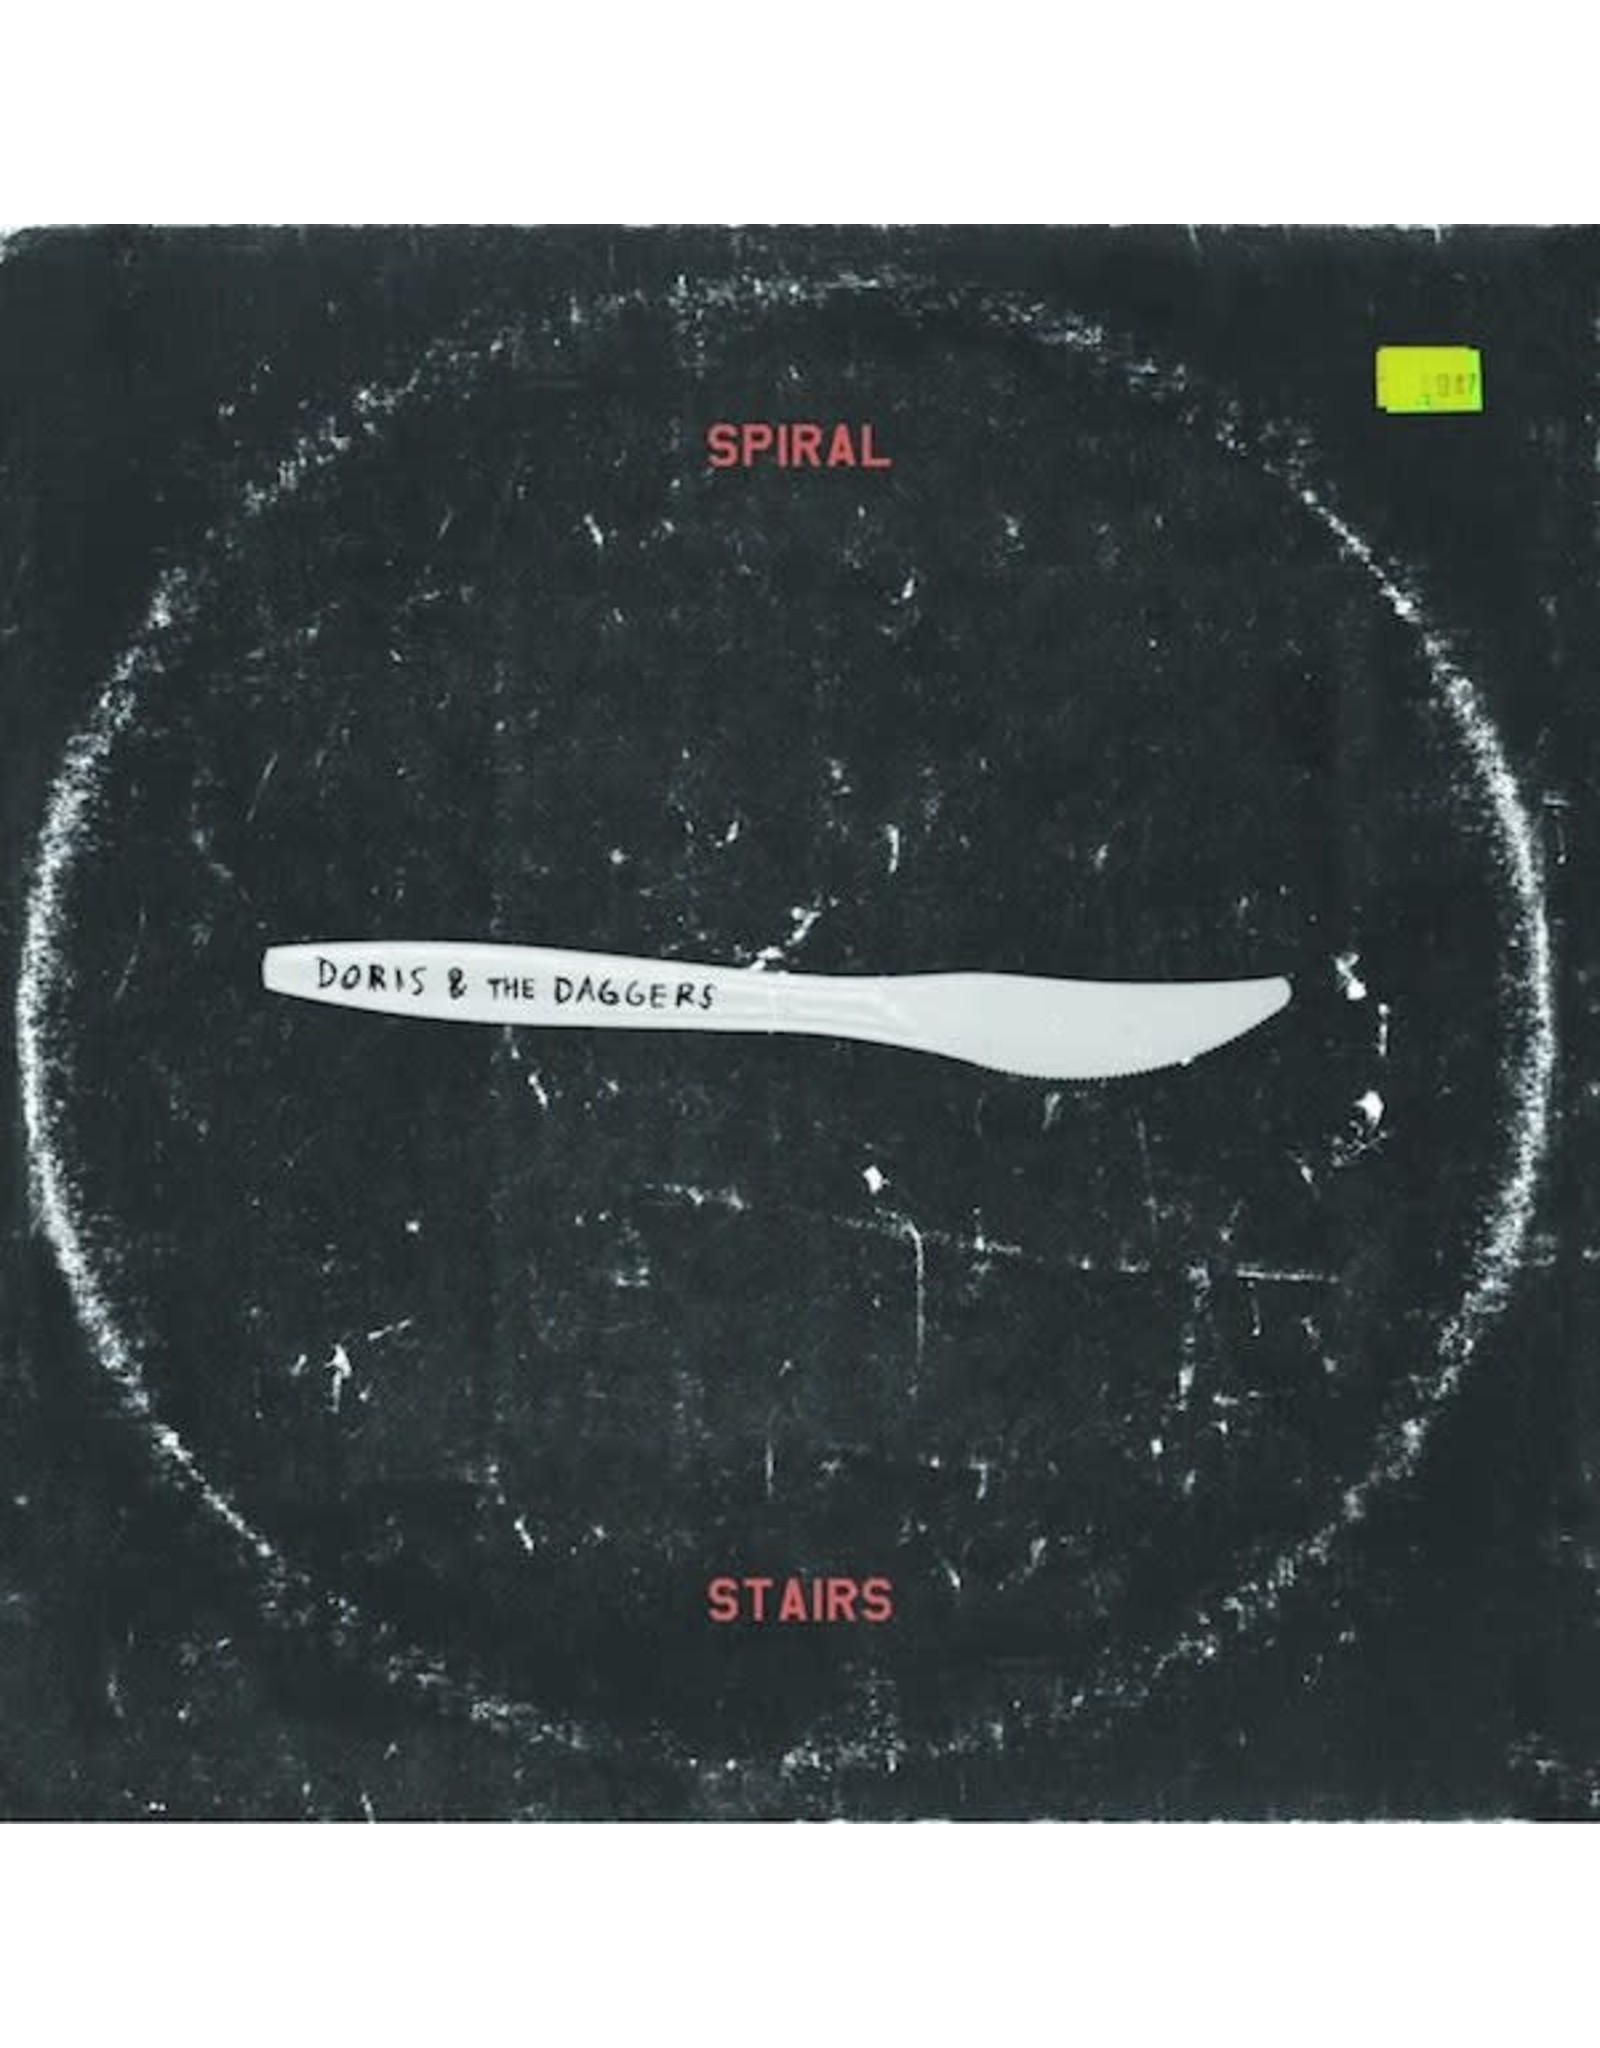 Doris & The Daggers - Spiral Stairs LP